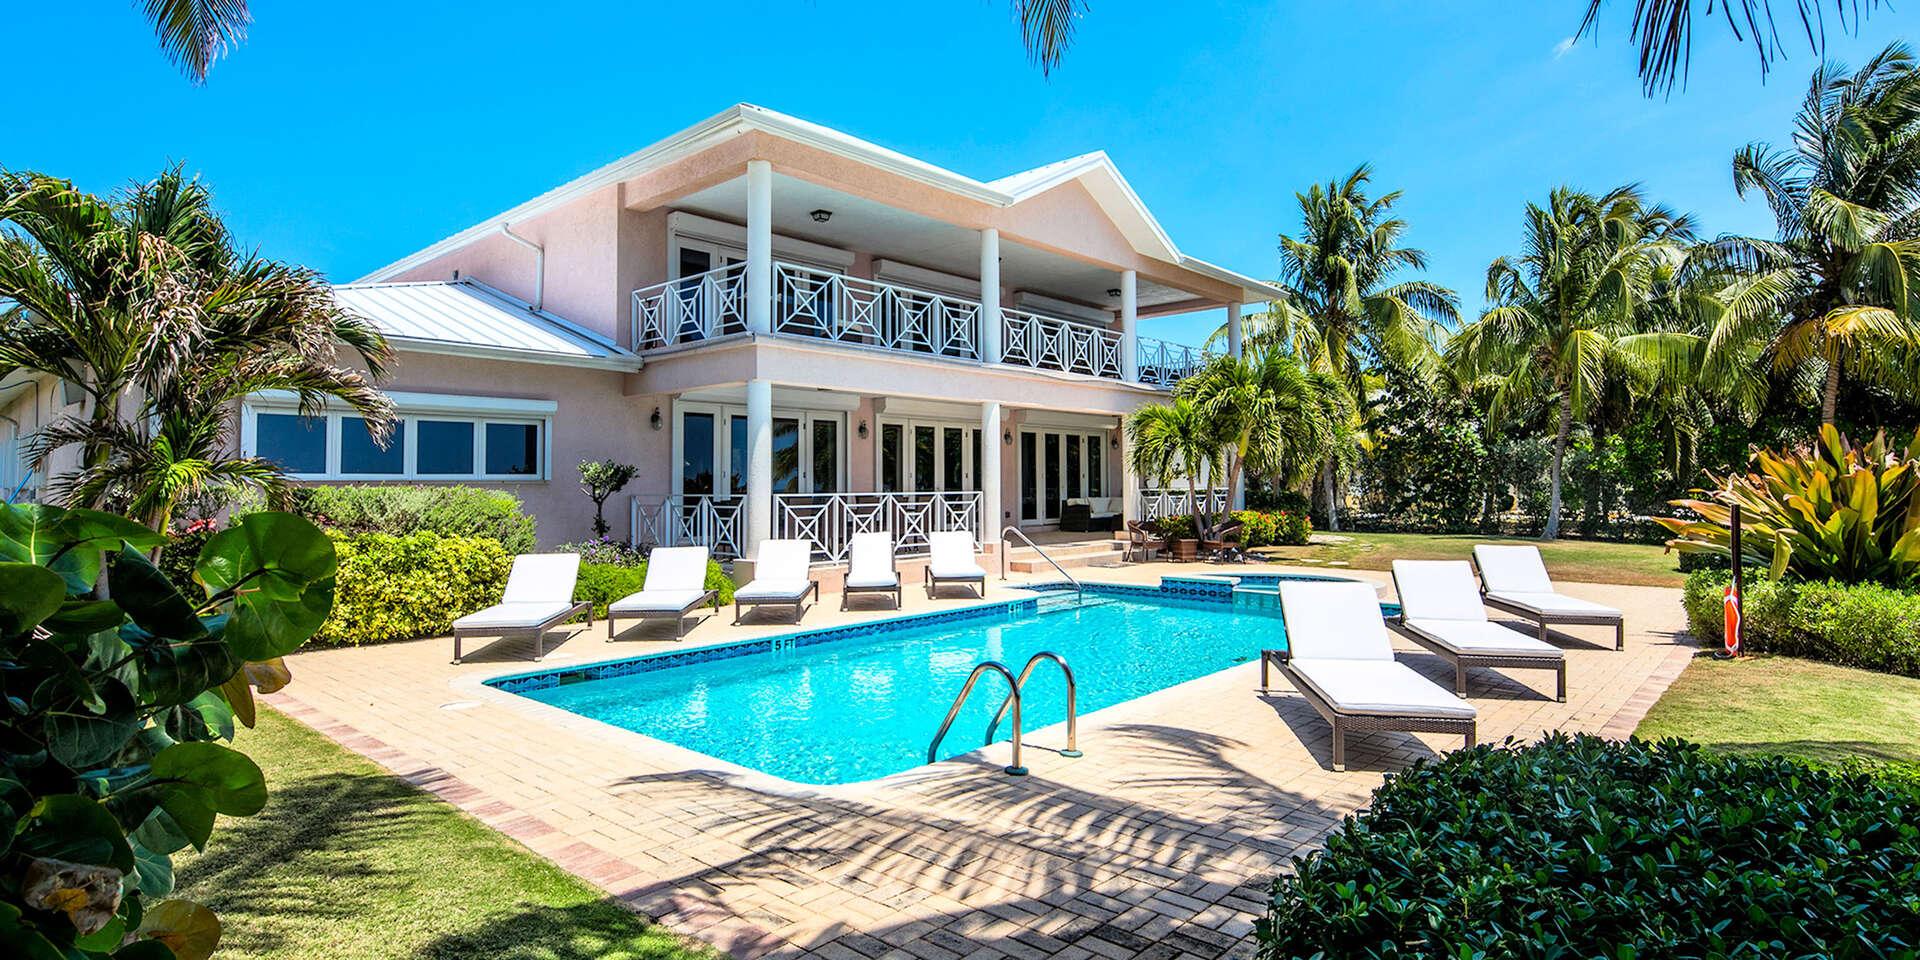 Luxury villa rentals caribbean - Cayman islands - Grand cayman - South sound - Amarone - Image 1/26